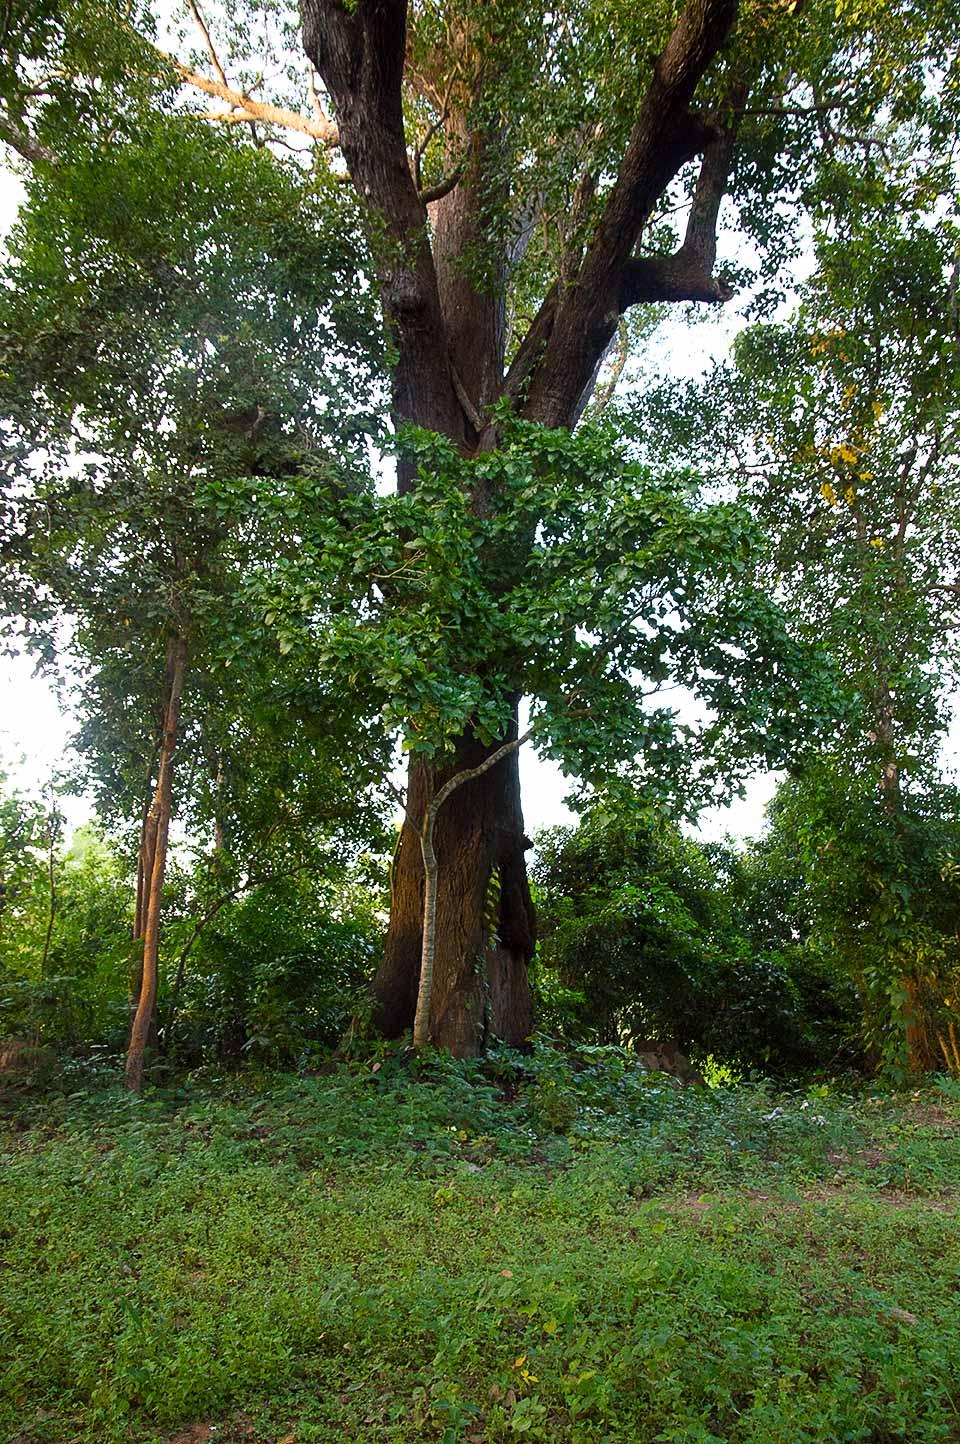 Heiliger Baum in der Leang Dai Kommune, Kambodscha